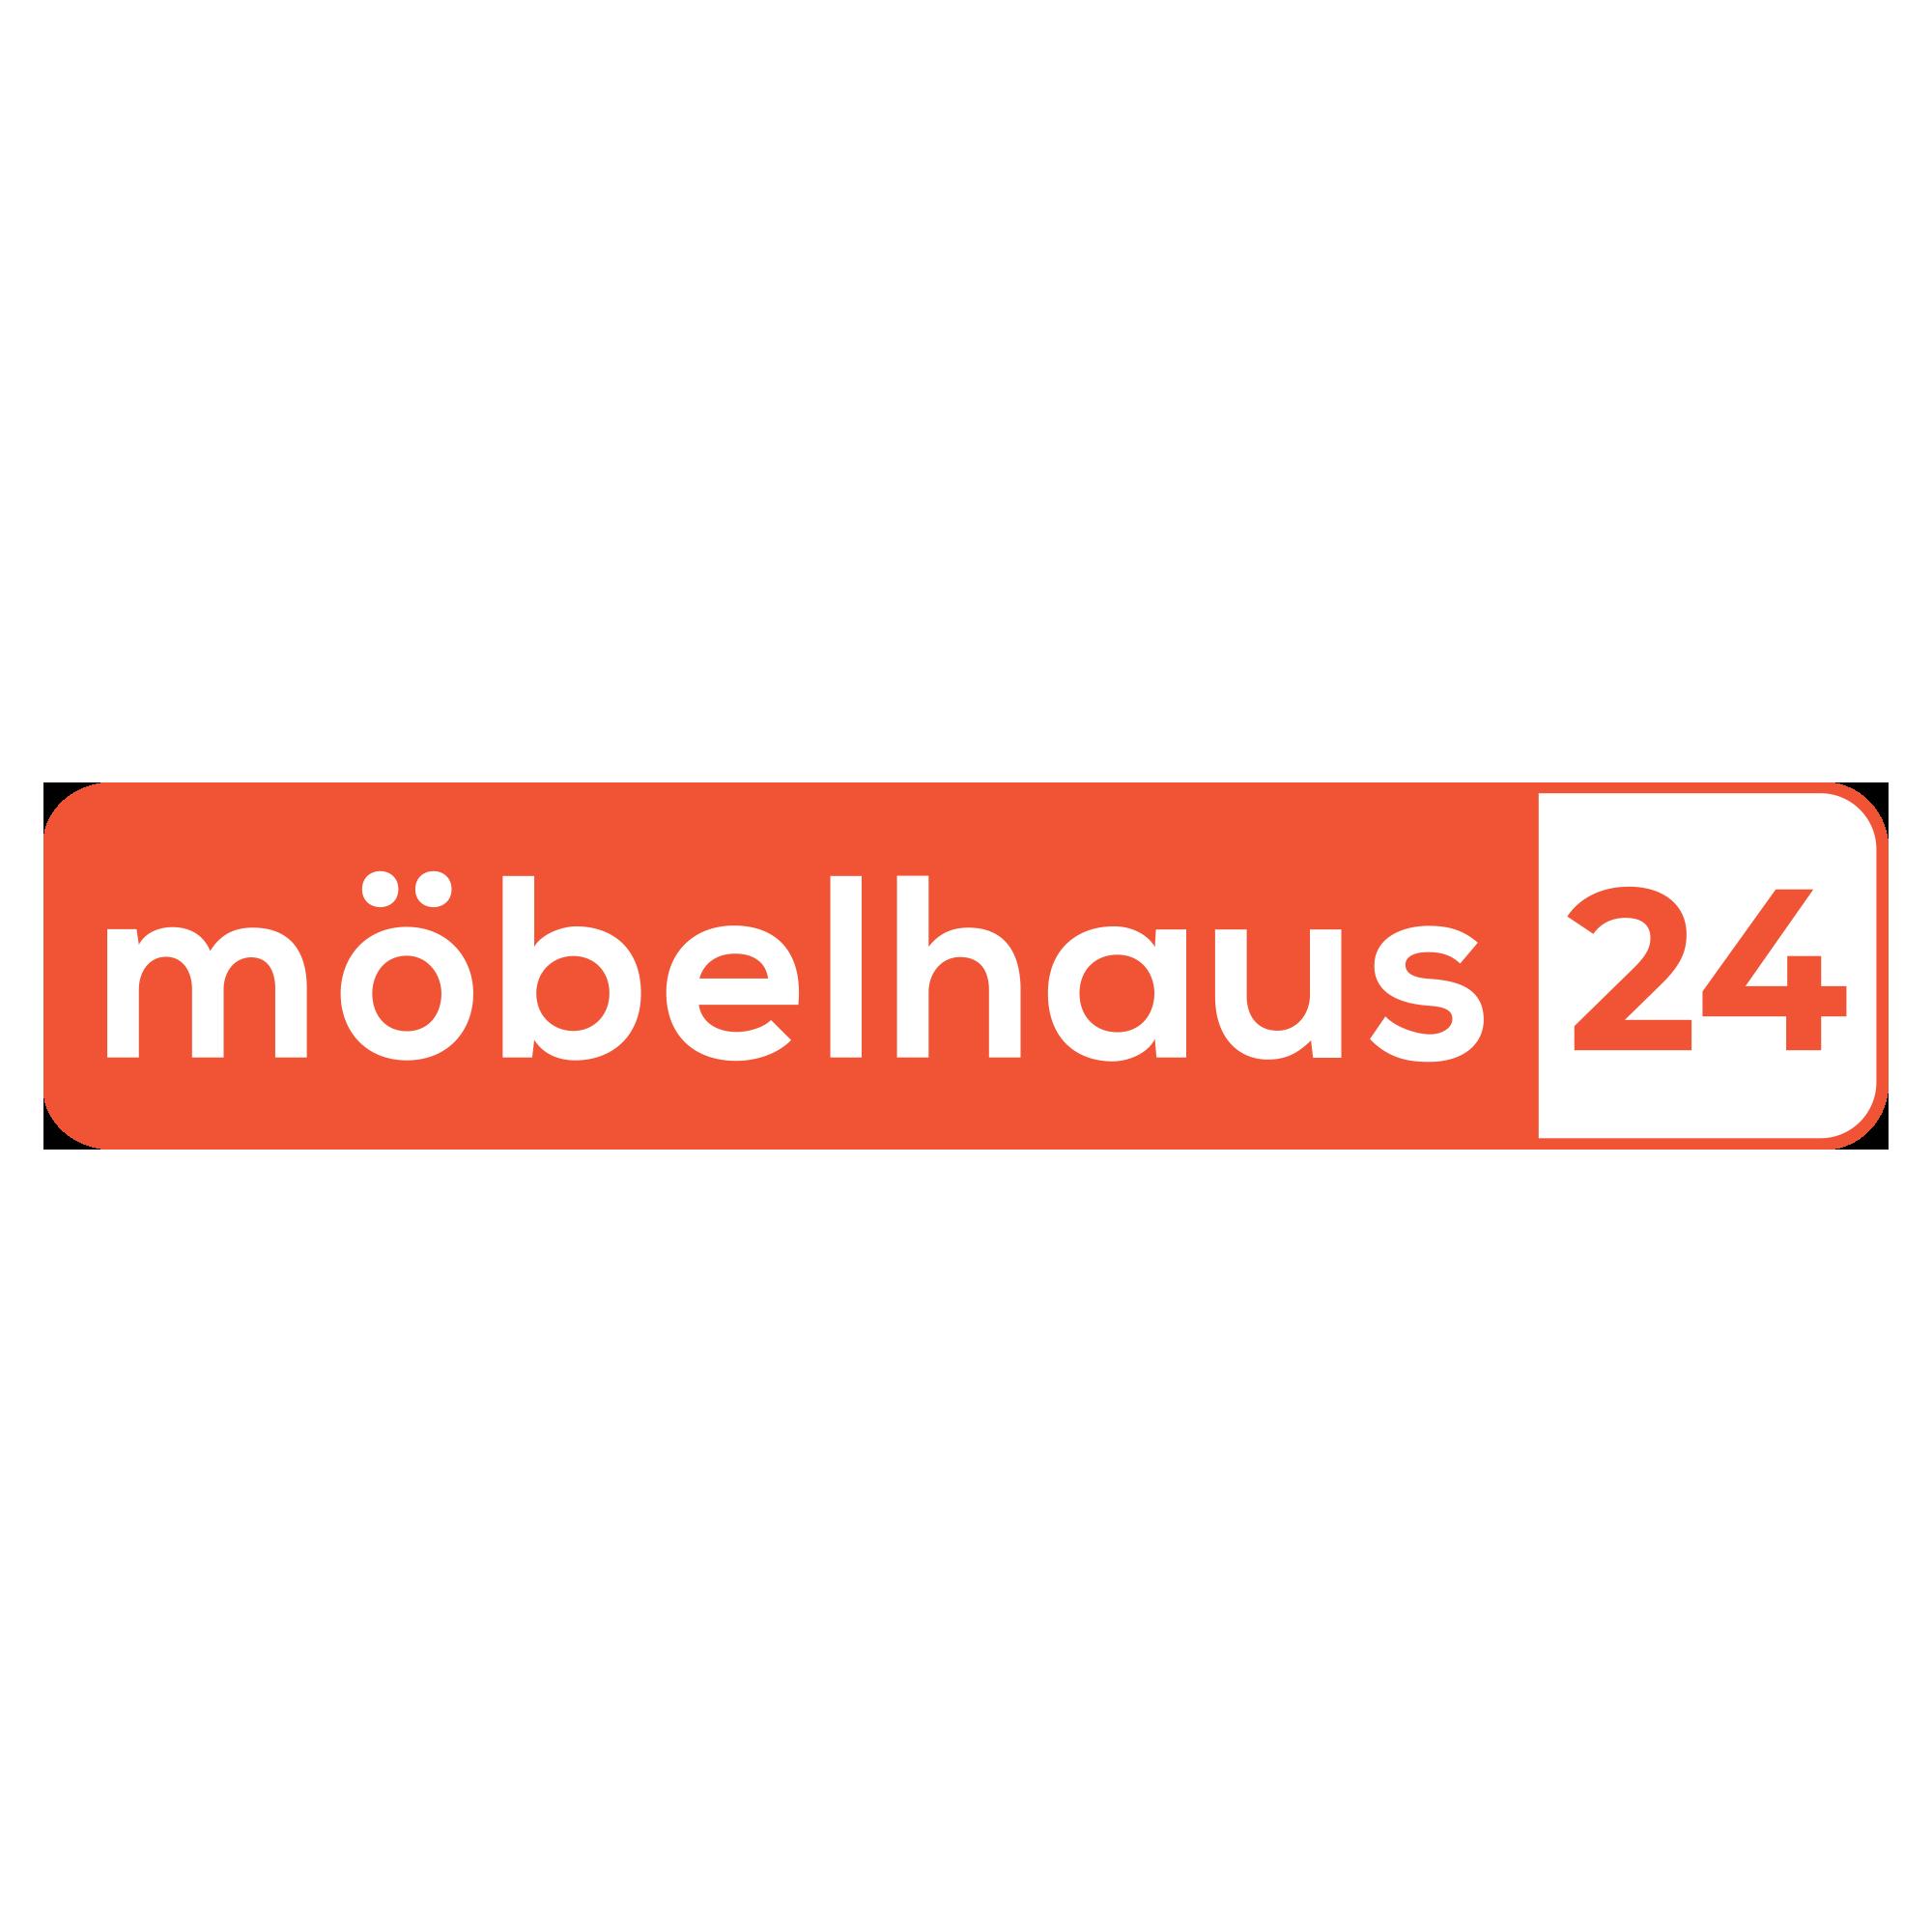 Möbelhaus24 - Design a new Logo for our furniture online portal